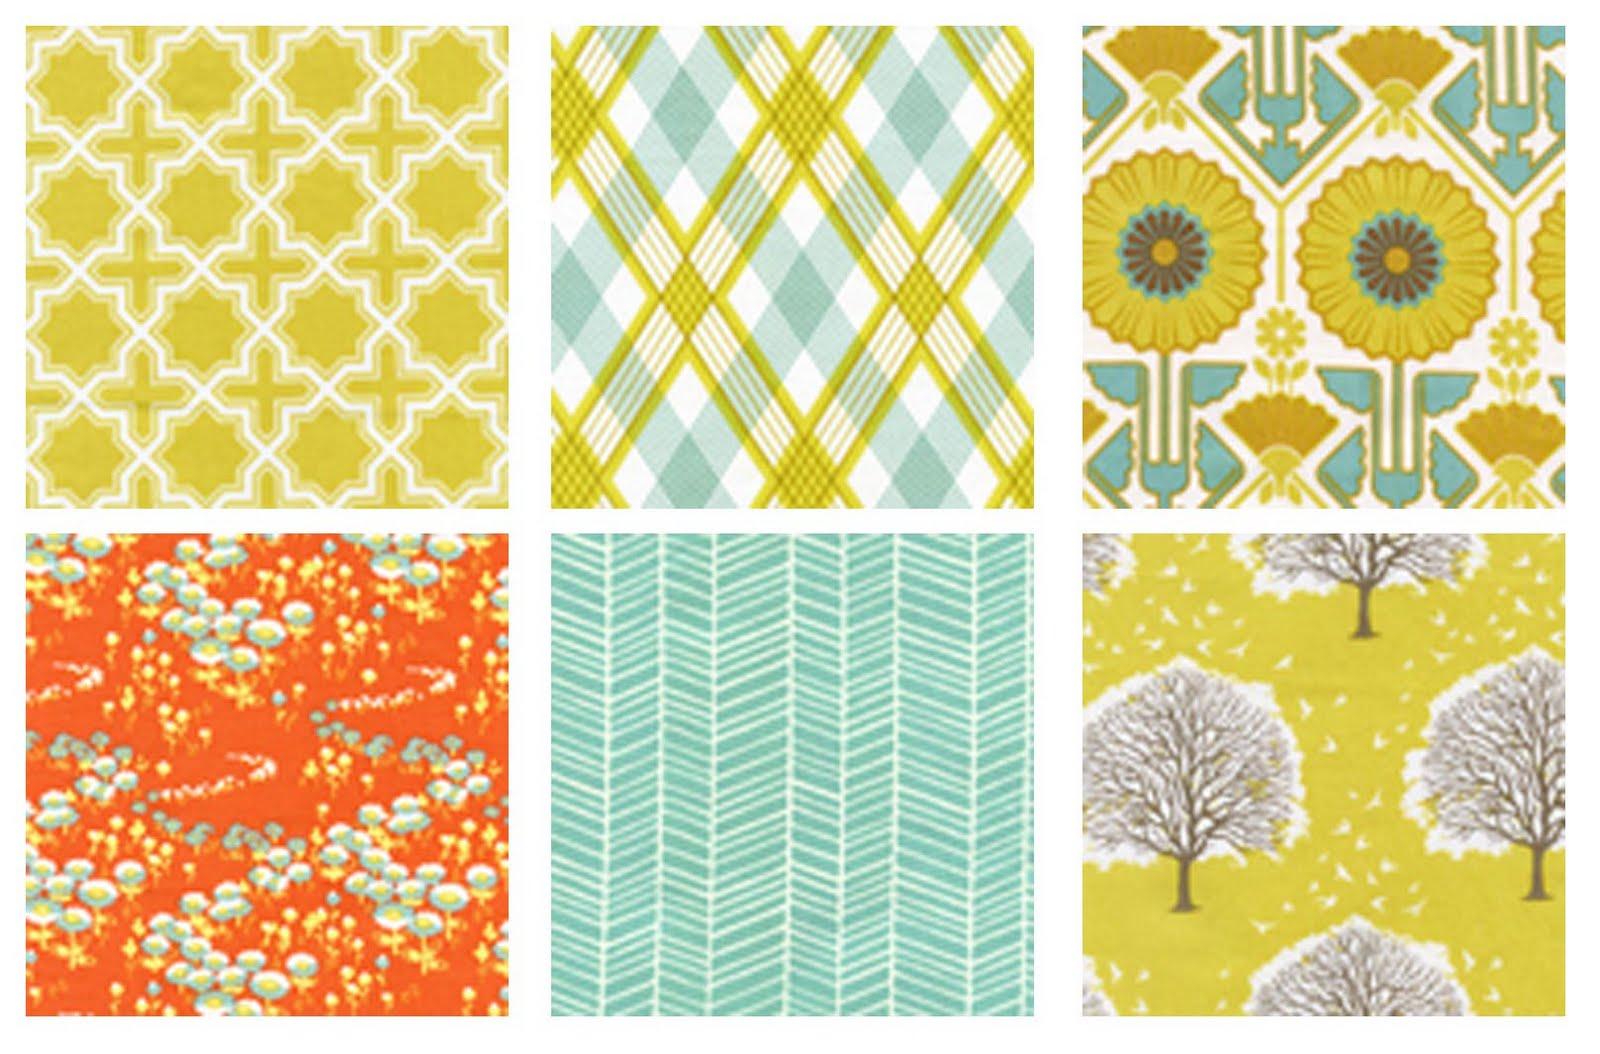 mid century modern fabric patterns. Black Bedroom Furniture Sets. Home Design Ideas